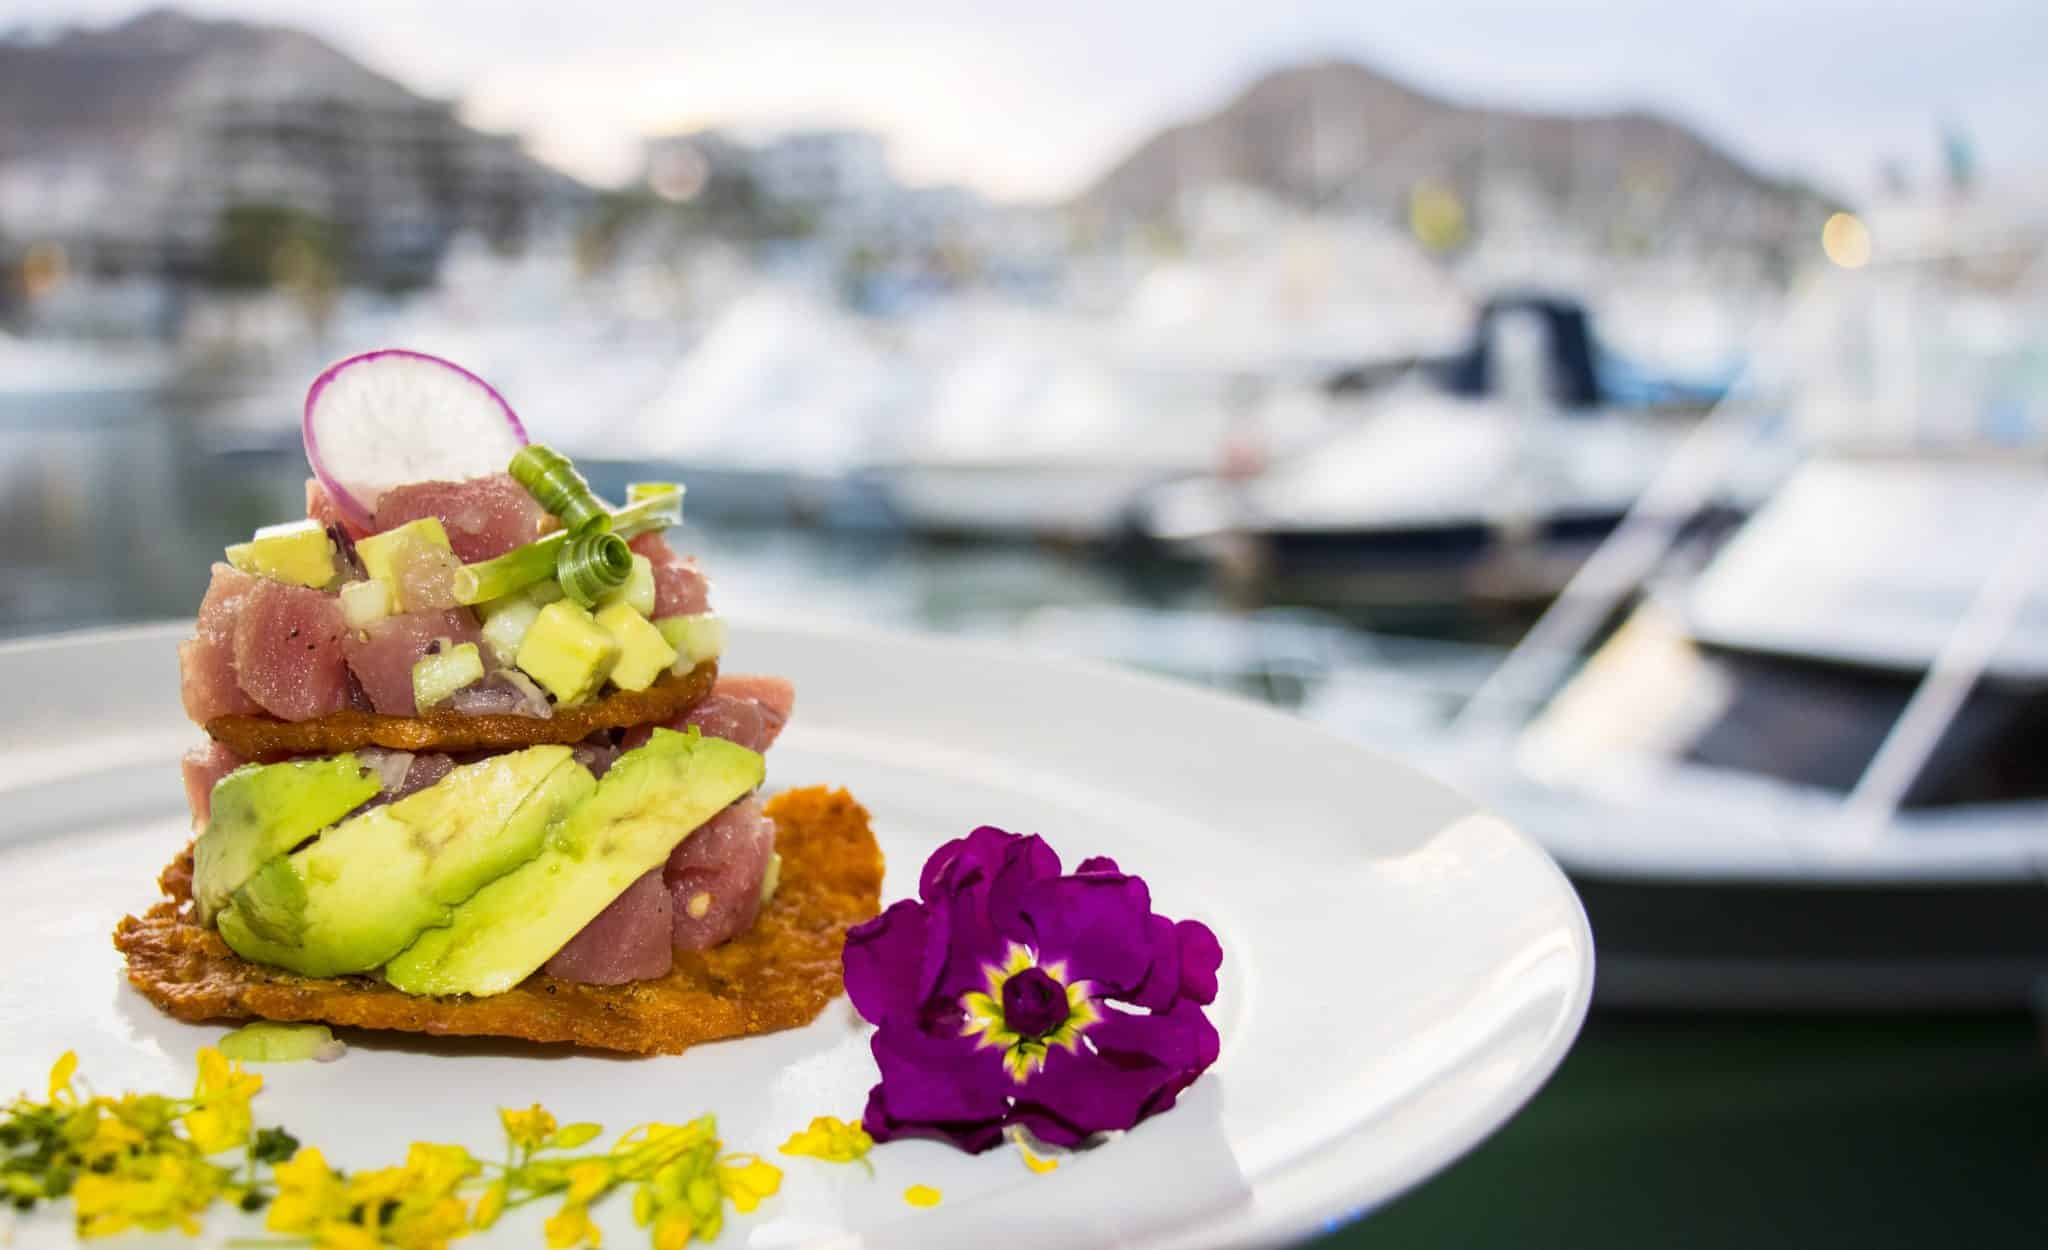 Golden Zone dining options in partnership with Hacienda ENcantada